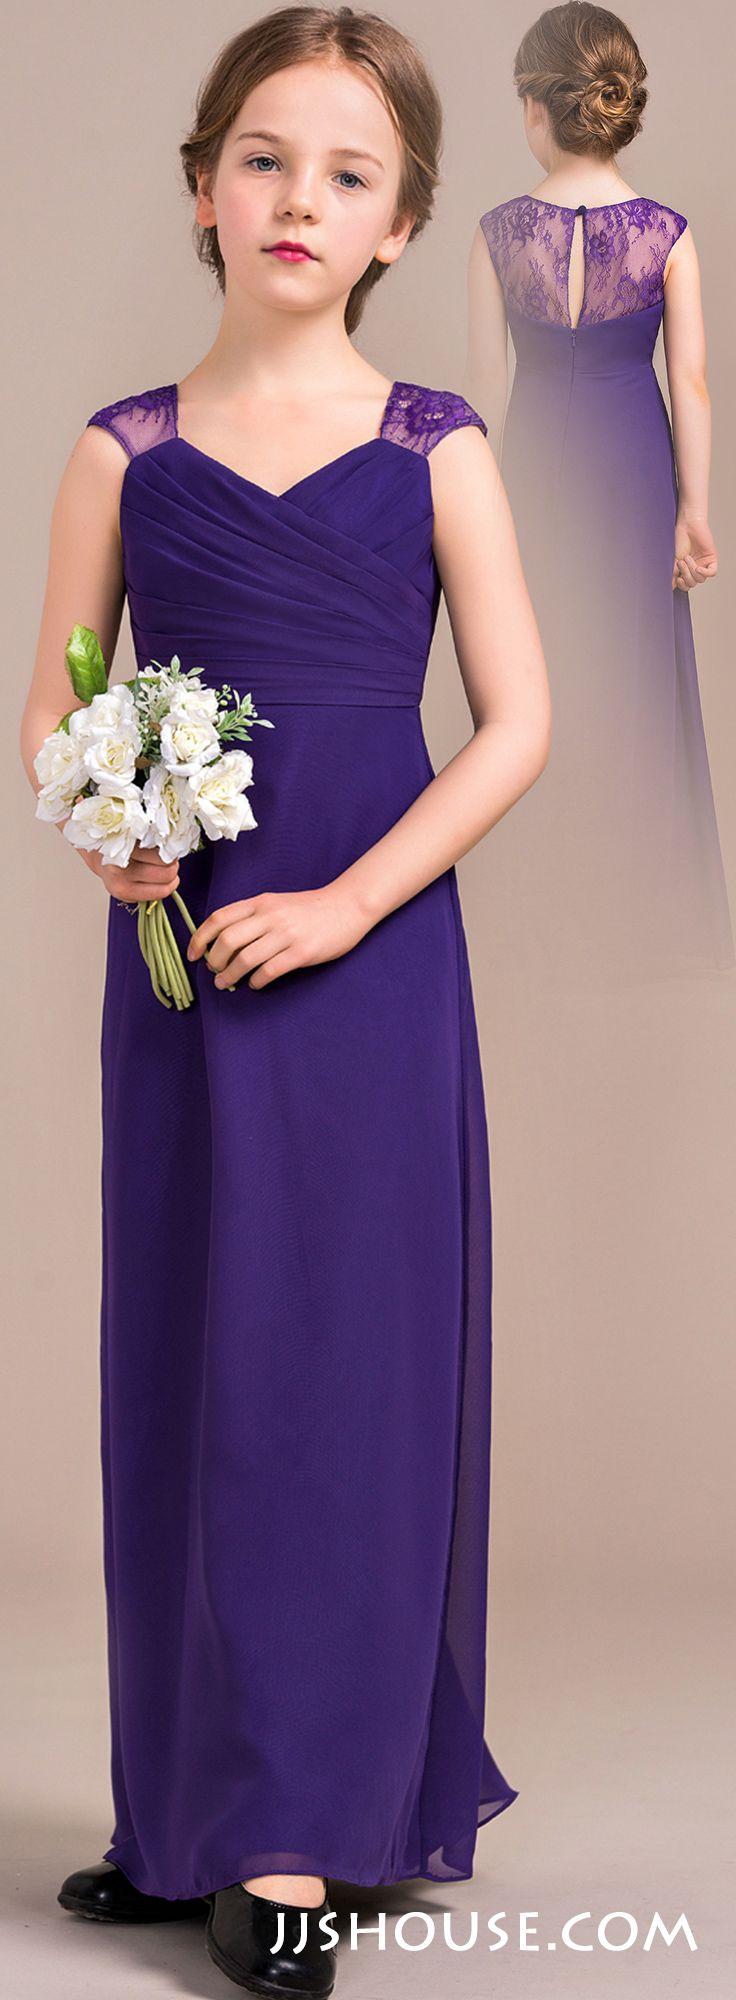 Junior bridesmaid hair accessories - Sheath Column V Neck Floor Length Chiffon Junior Bridesmaid Dress With Ruffle 009081142